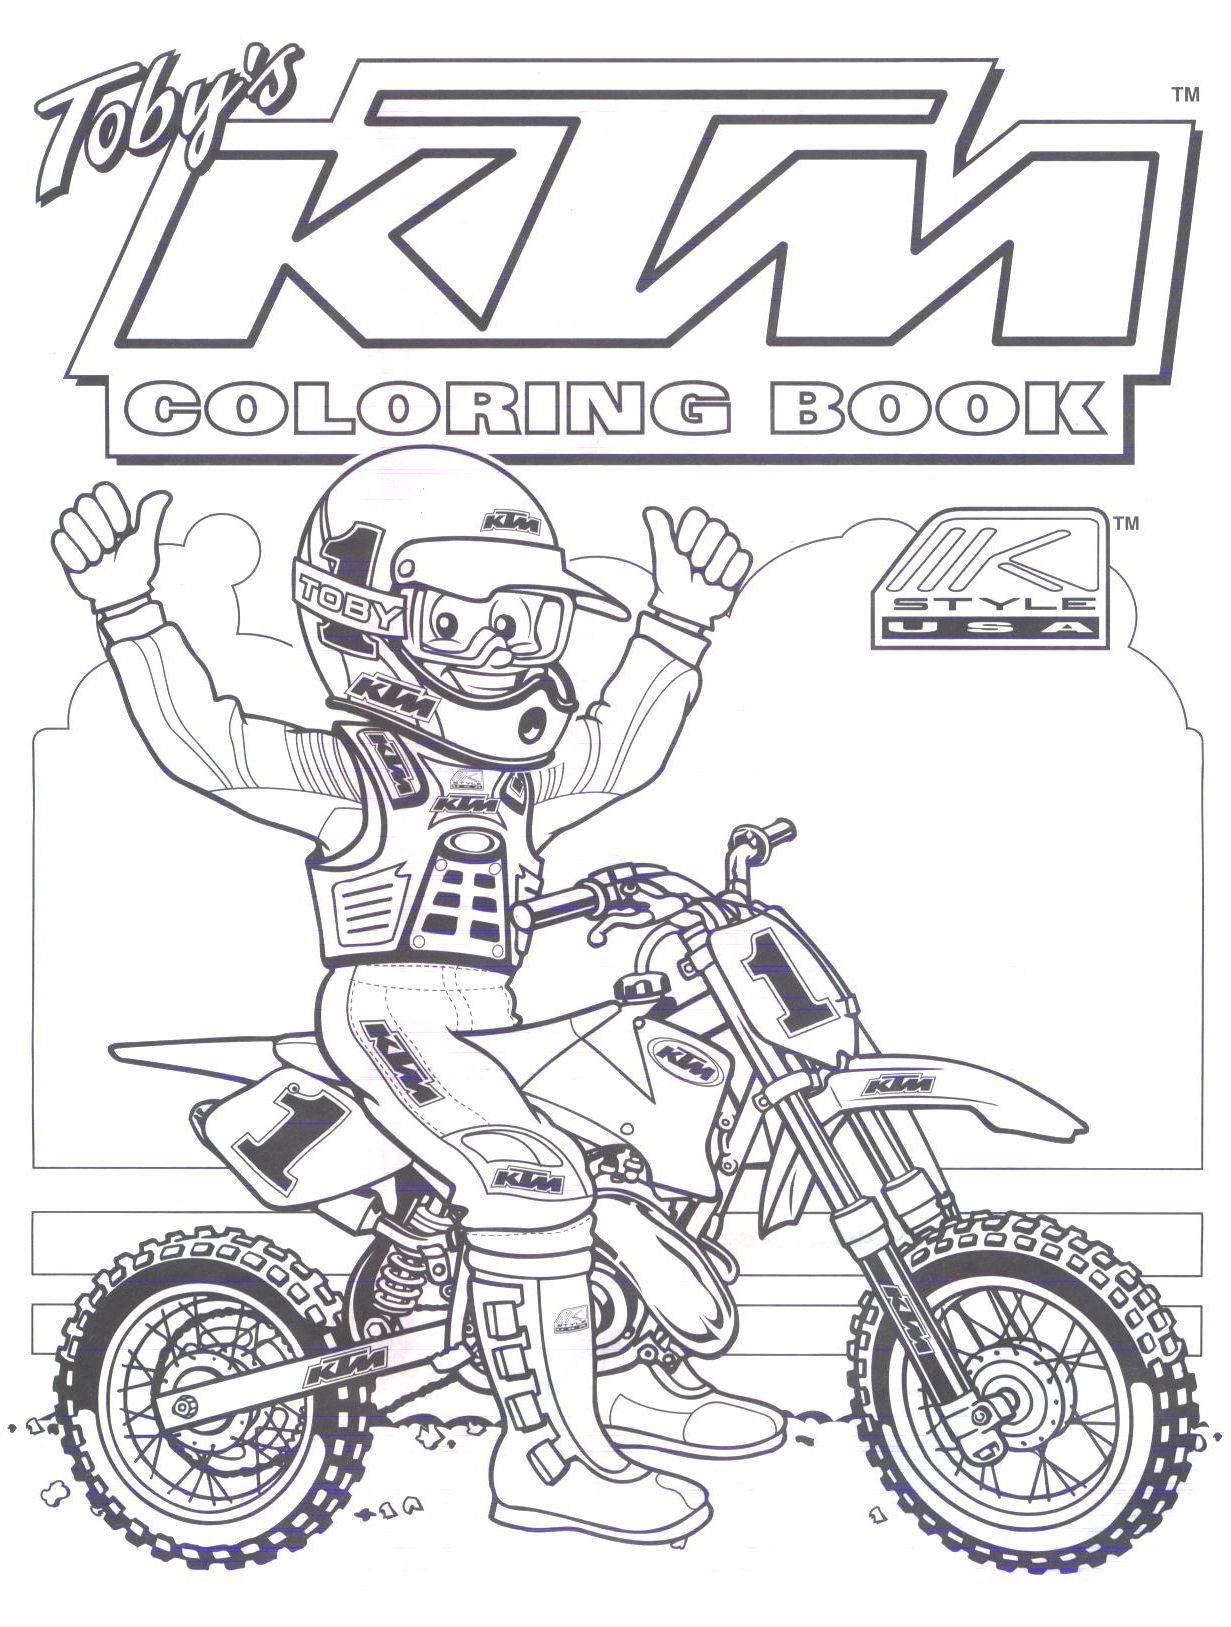 Dirt Bike Coloring Pages Ktm Dirt Bike Coloring Pages In 2020 Dirt Bike Birthday Bike Birthday Parties Ktm Dirt Bikes